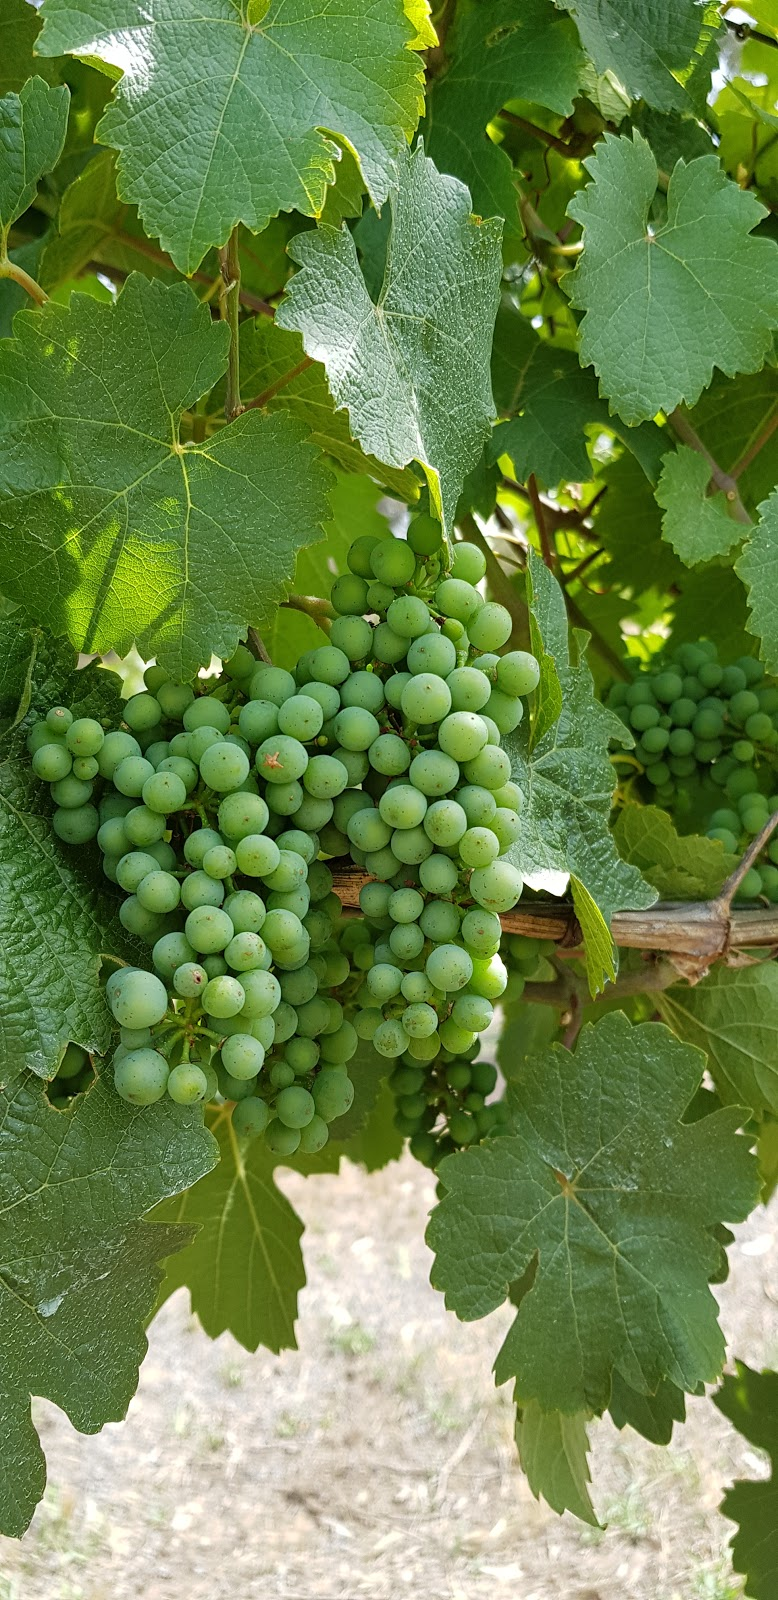 Harcourt Valley Vineyards   food   3339 Harmony Way, Harcourt VIC 3453, Australia   0354742223 OR +61 3 5474 2223